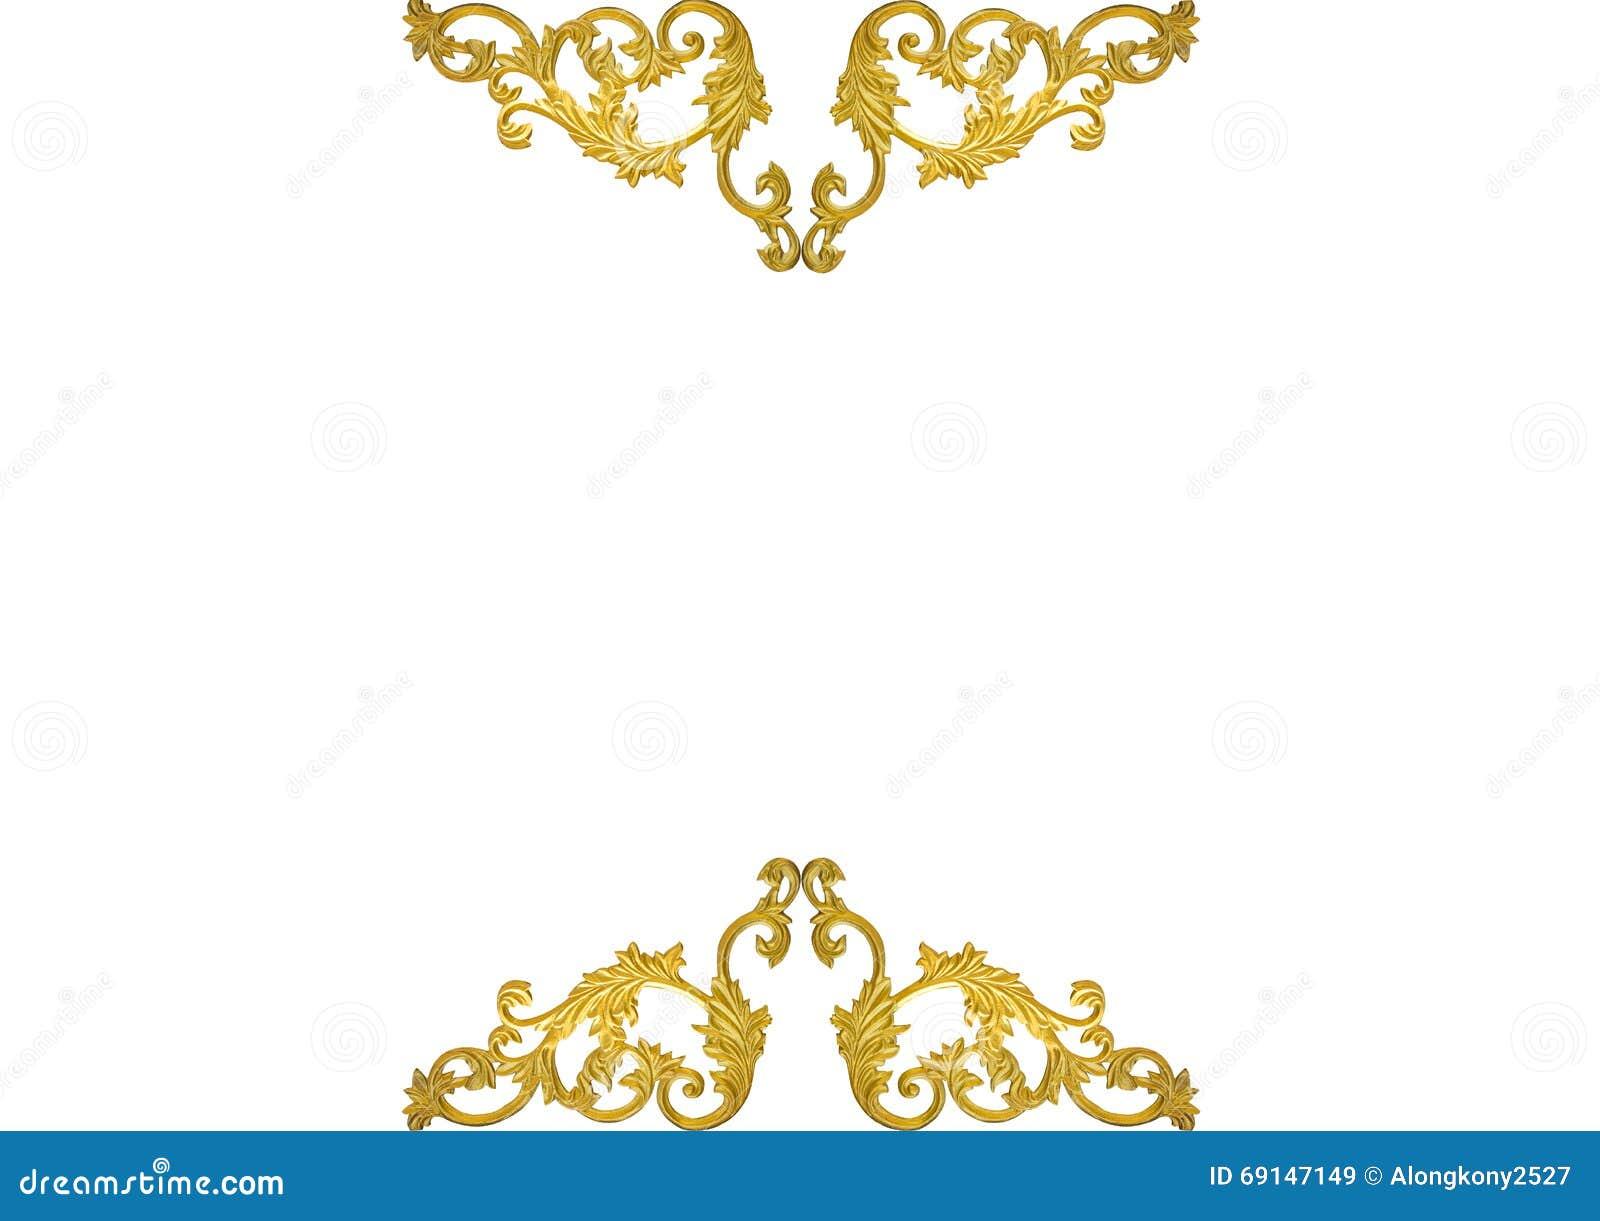 Roman Designs Patterns